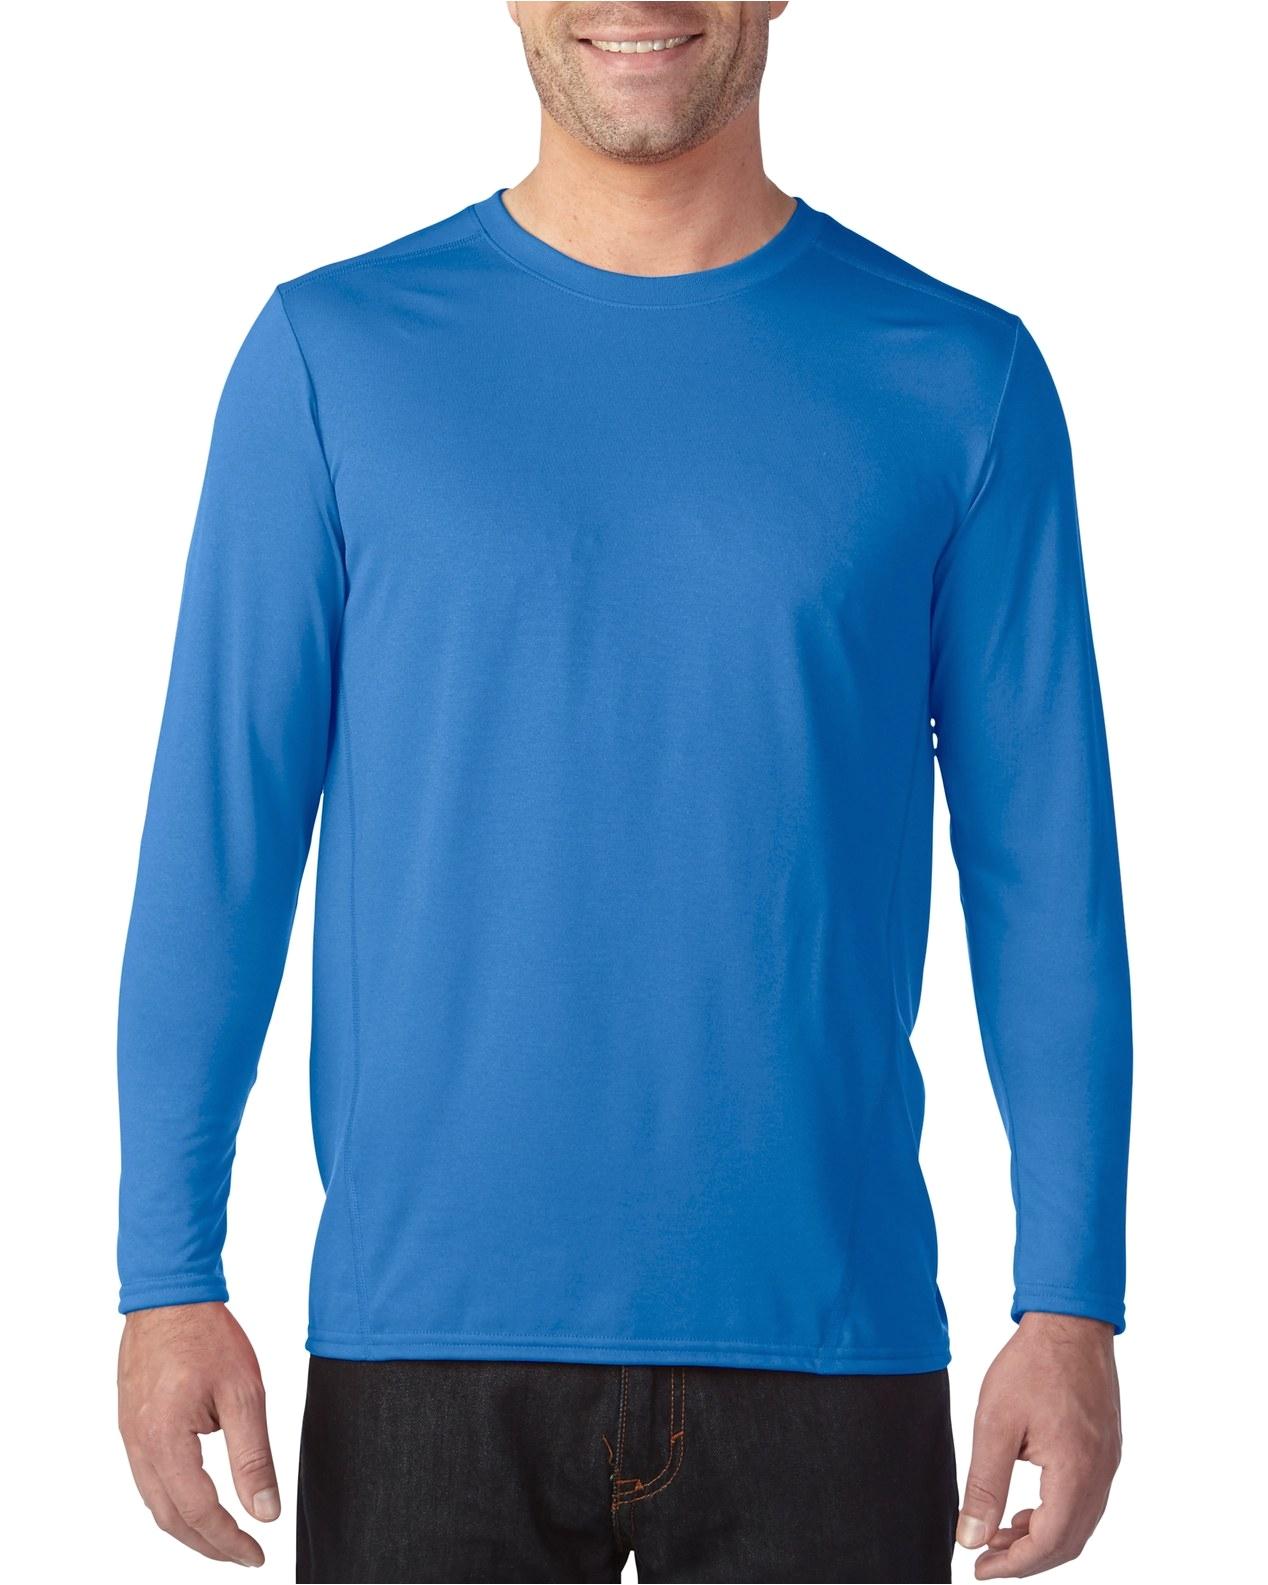 47400 gildan performancea 4 7 oz yda² adult long sleeve tech t shirt gildan